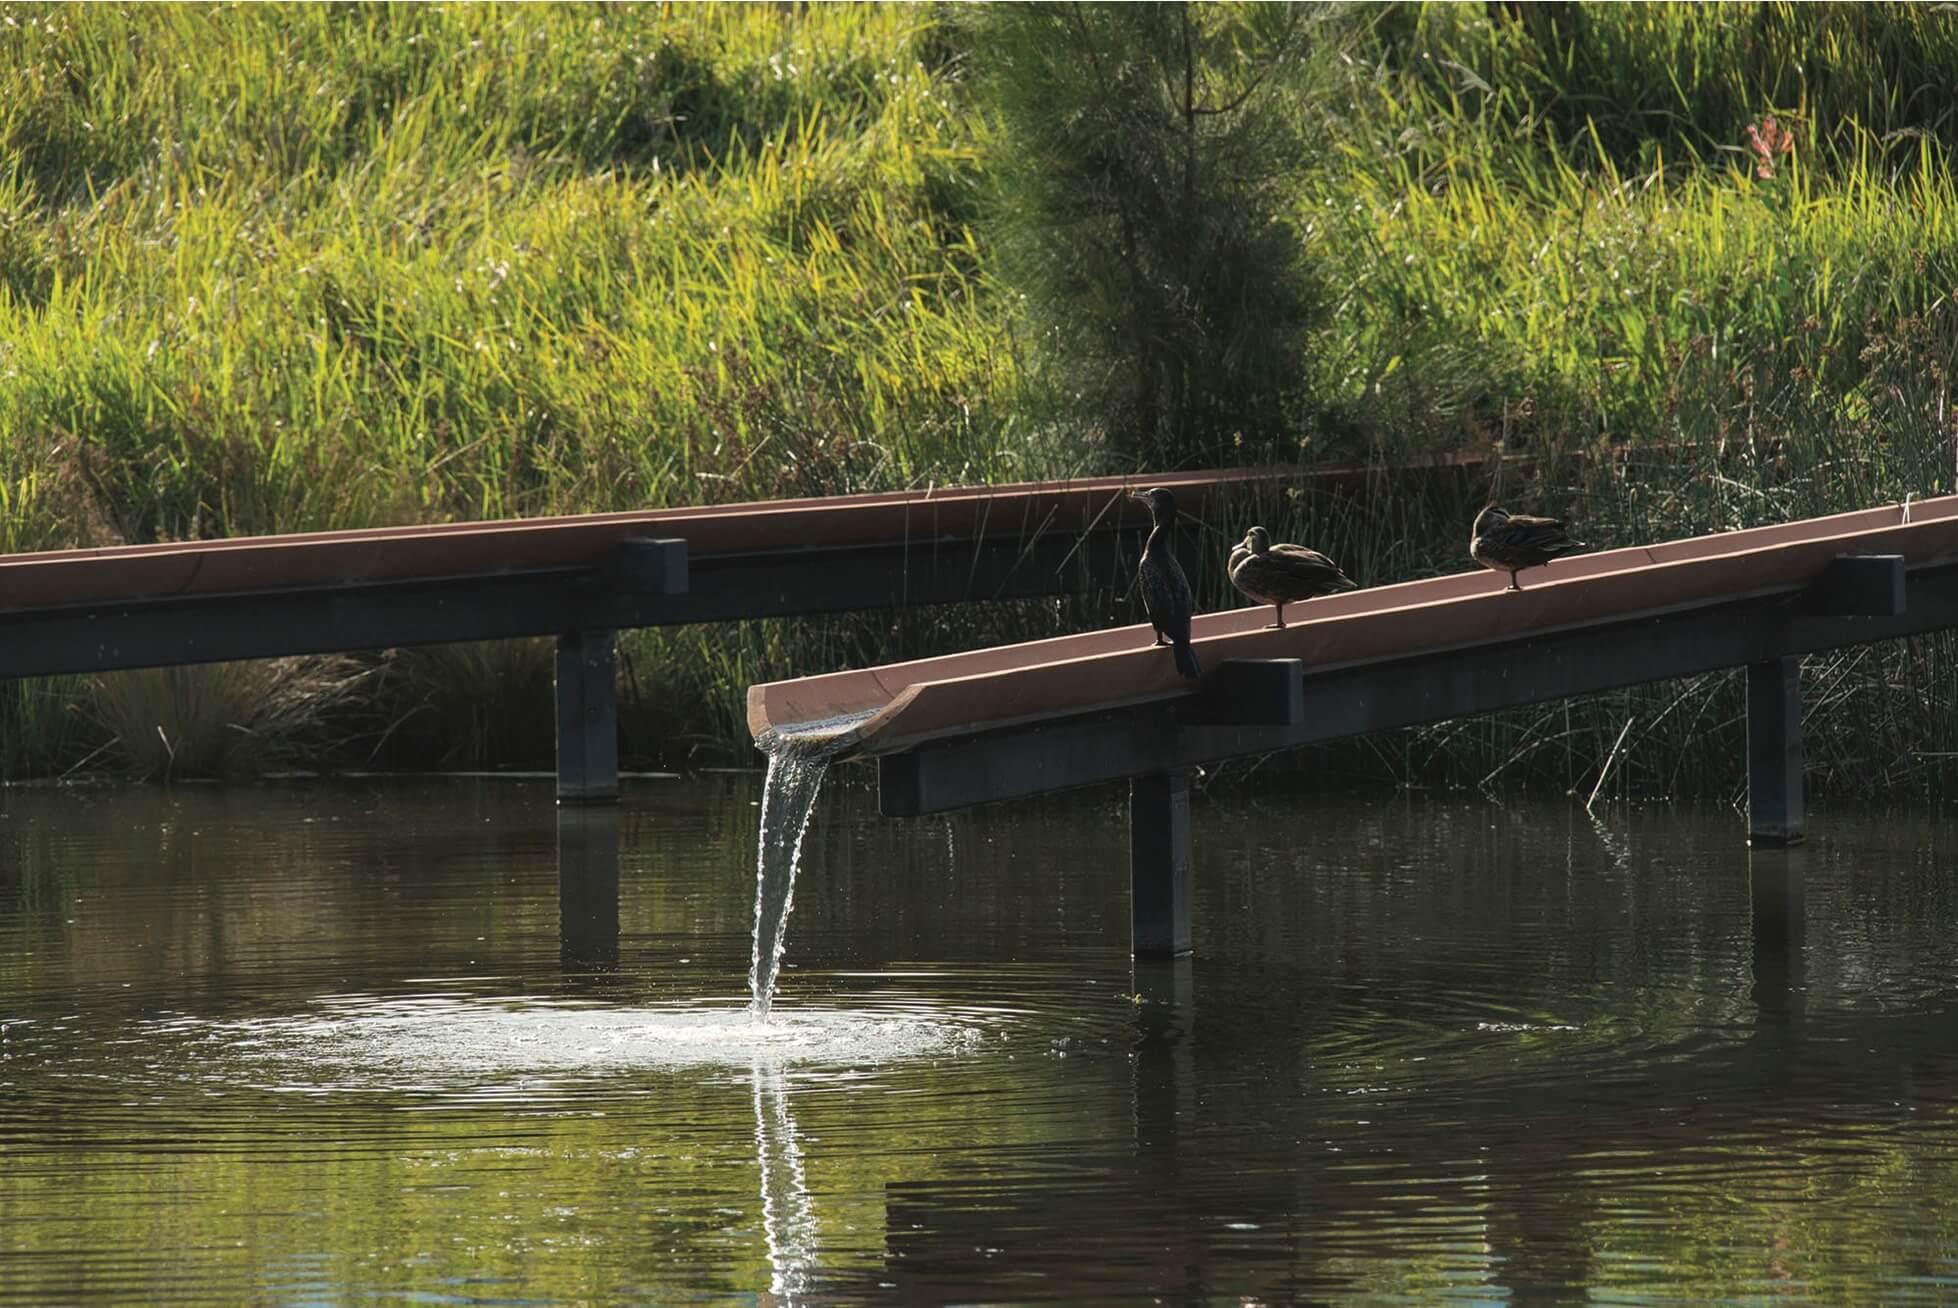 Sydney Park Water Re-Use Project, Australia, AZ Awards 2019